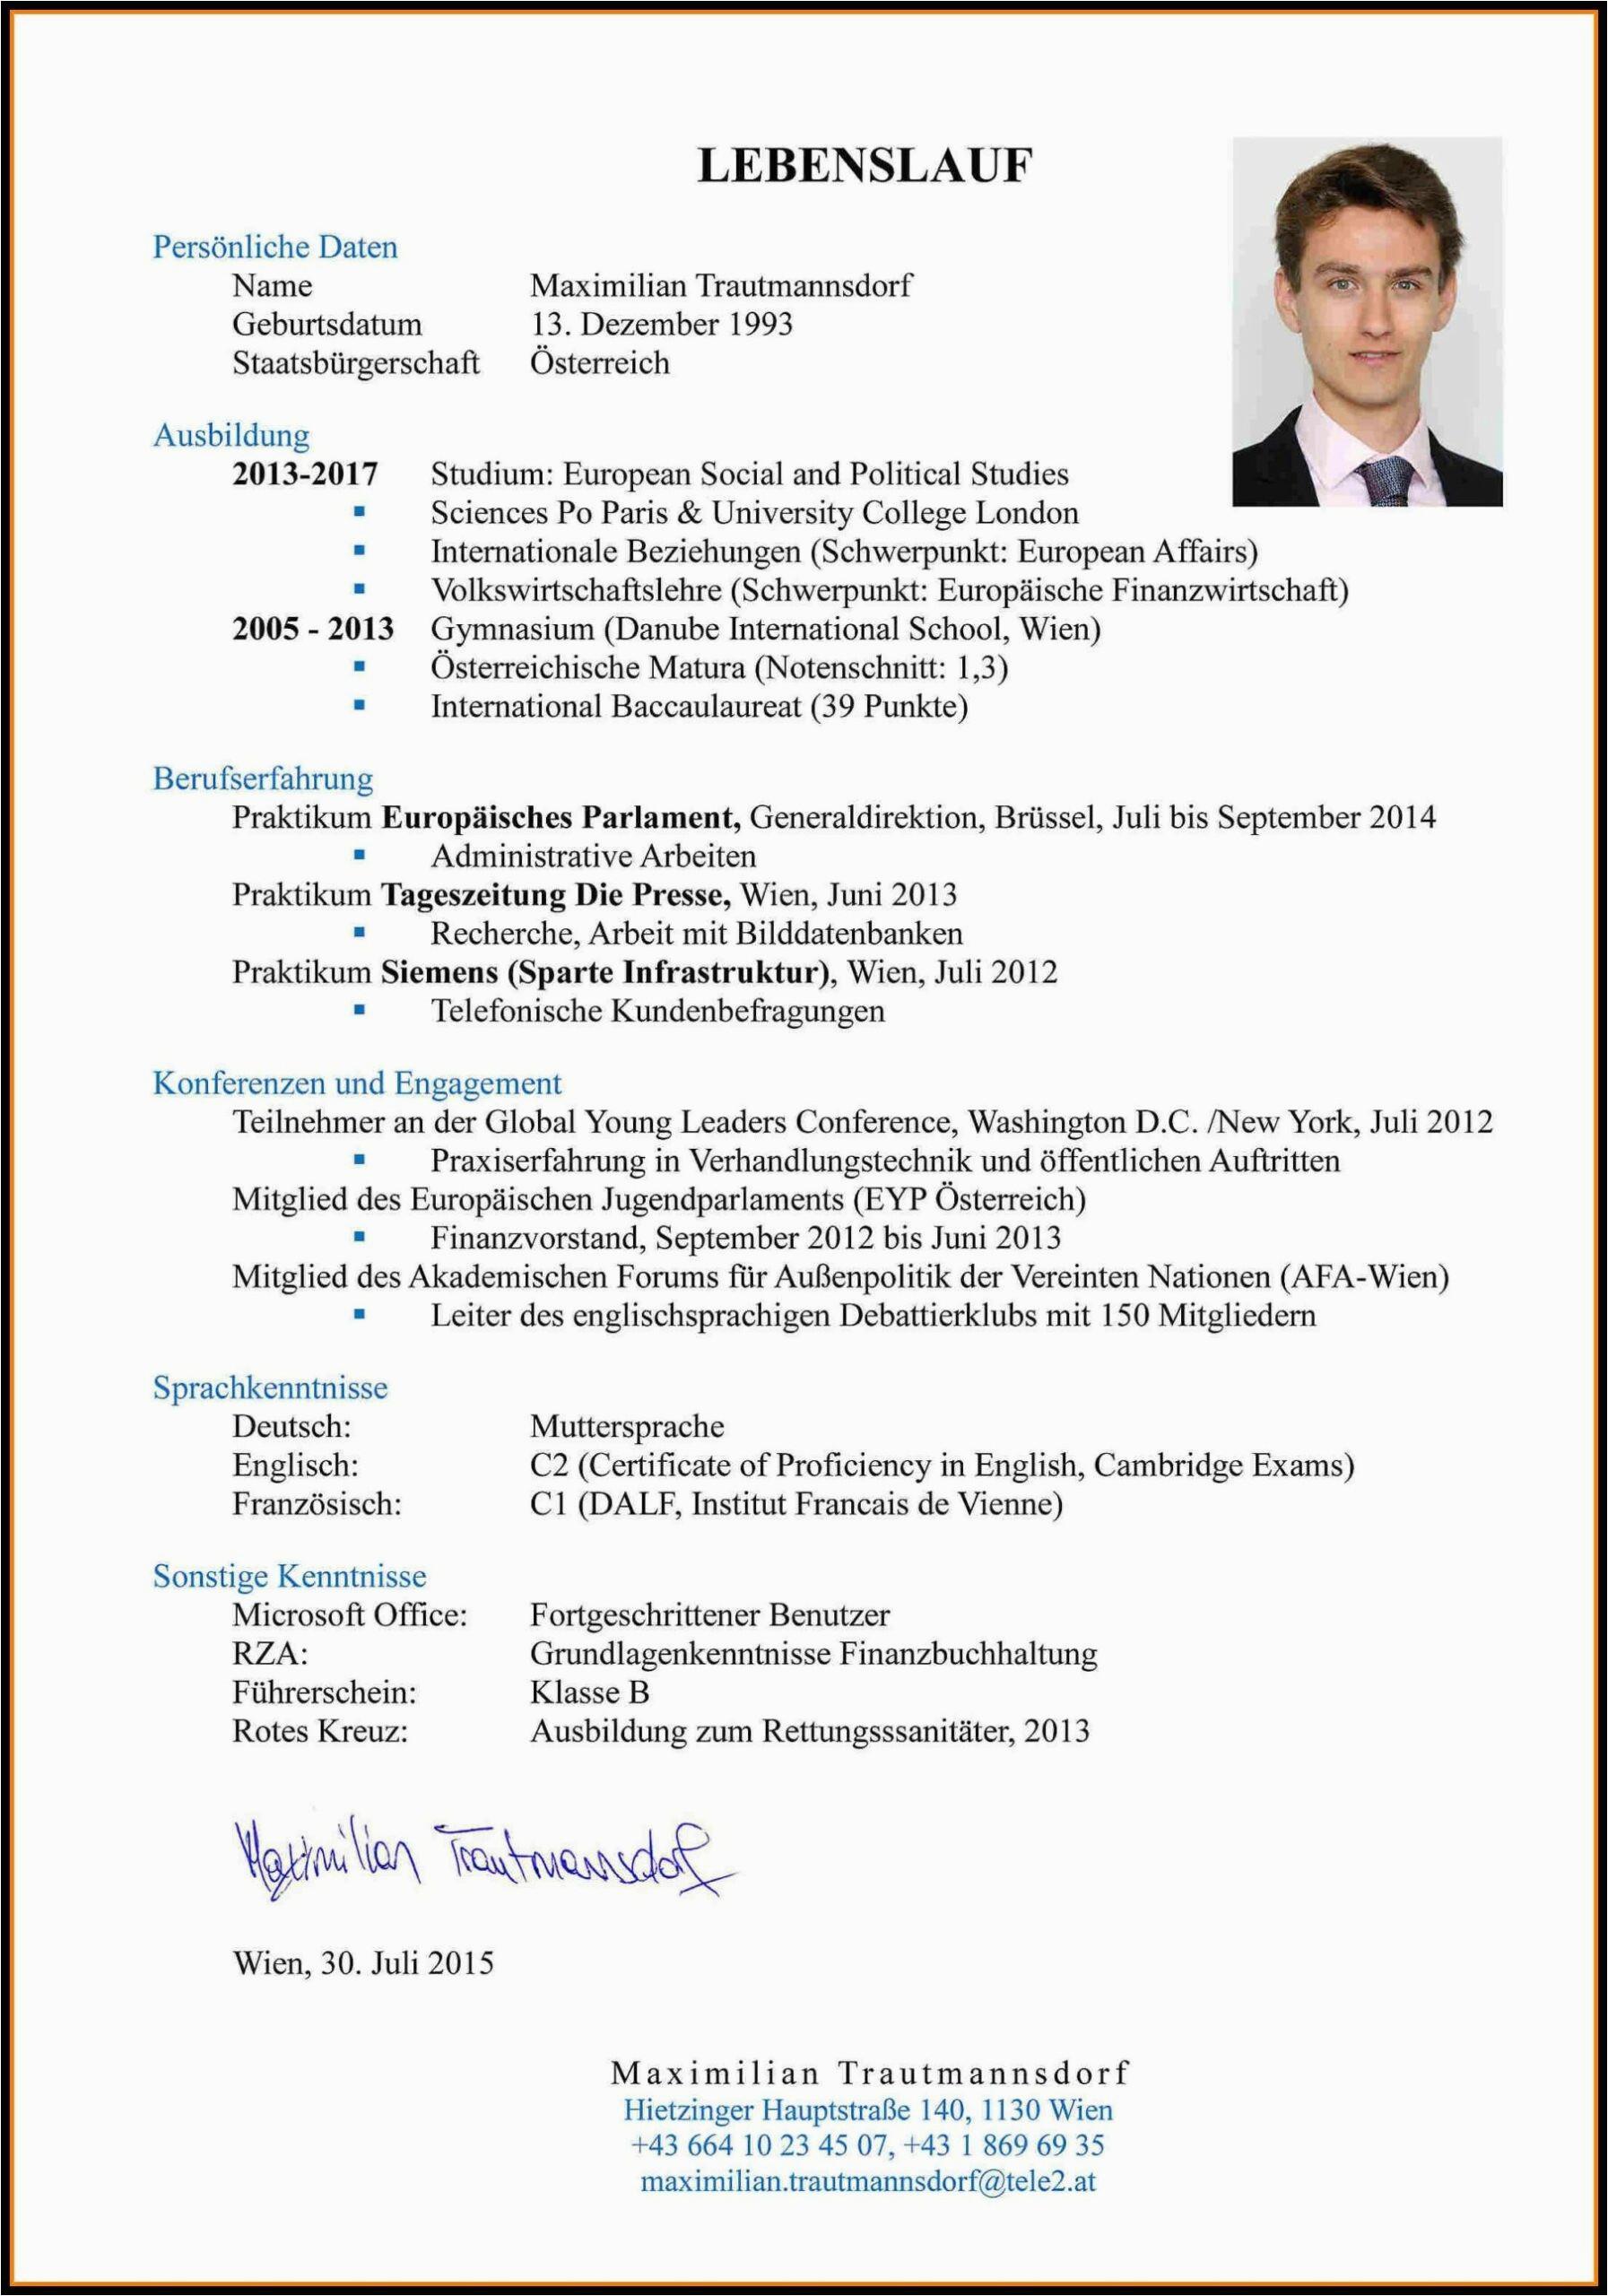 lebenslauf schuelerpraktikum klasse muster kostenlos vorlage praktikum pdf 20 bewerbung 9 dt swiss m1900 referenzschreiben sozialpraktikum praktikumszeugnis